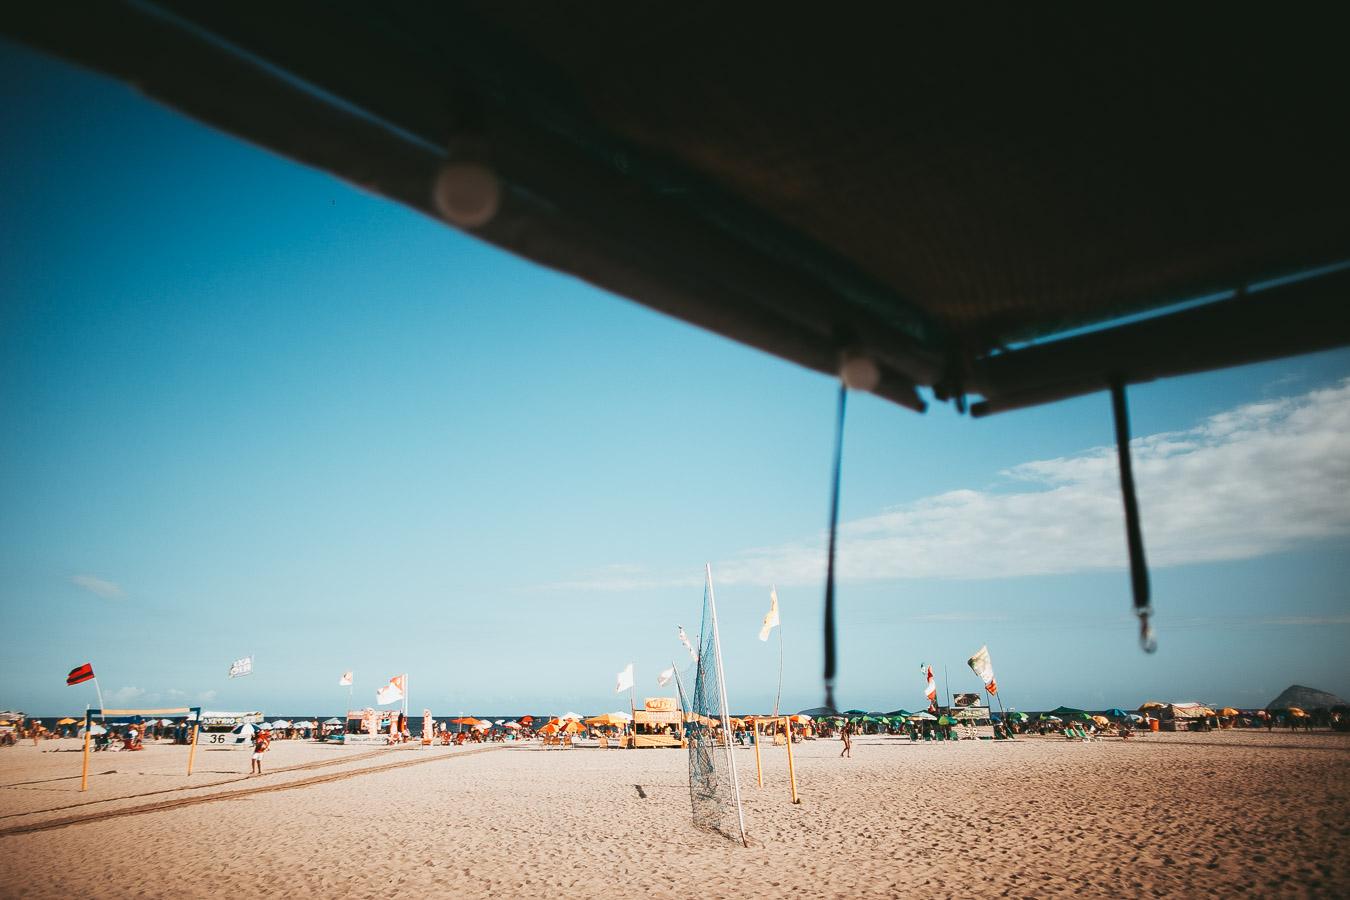 ROMPIENDO ¡en la playa!